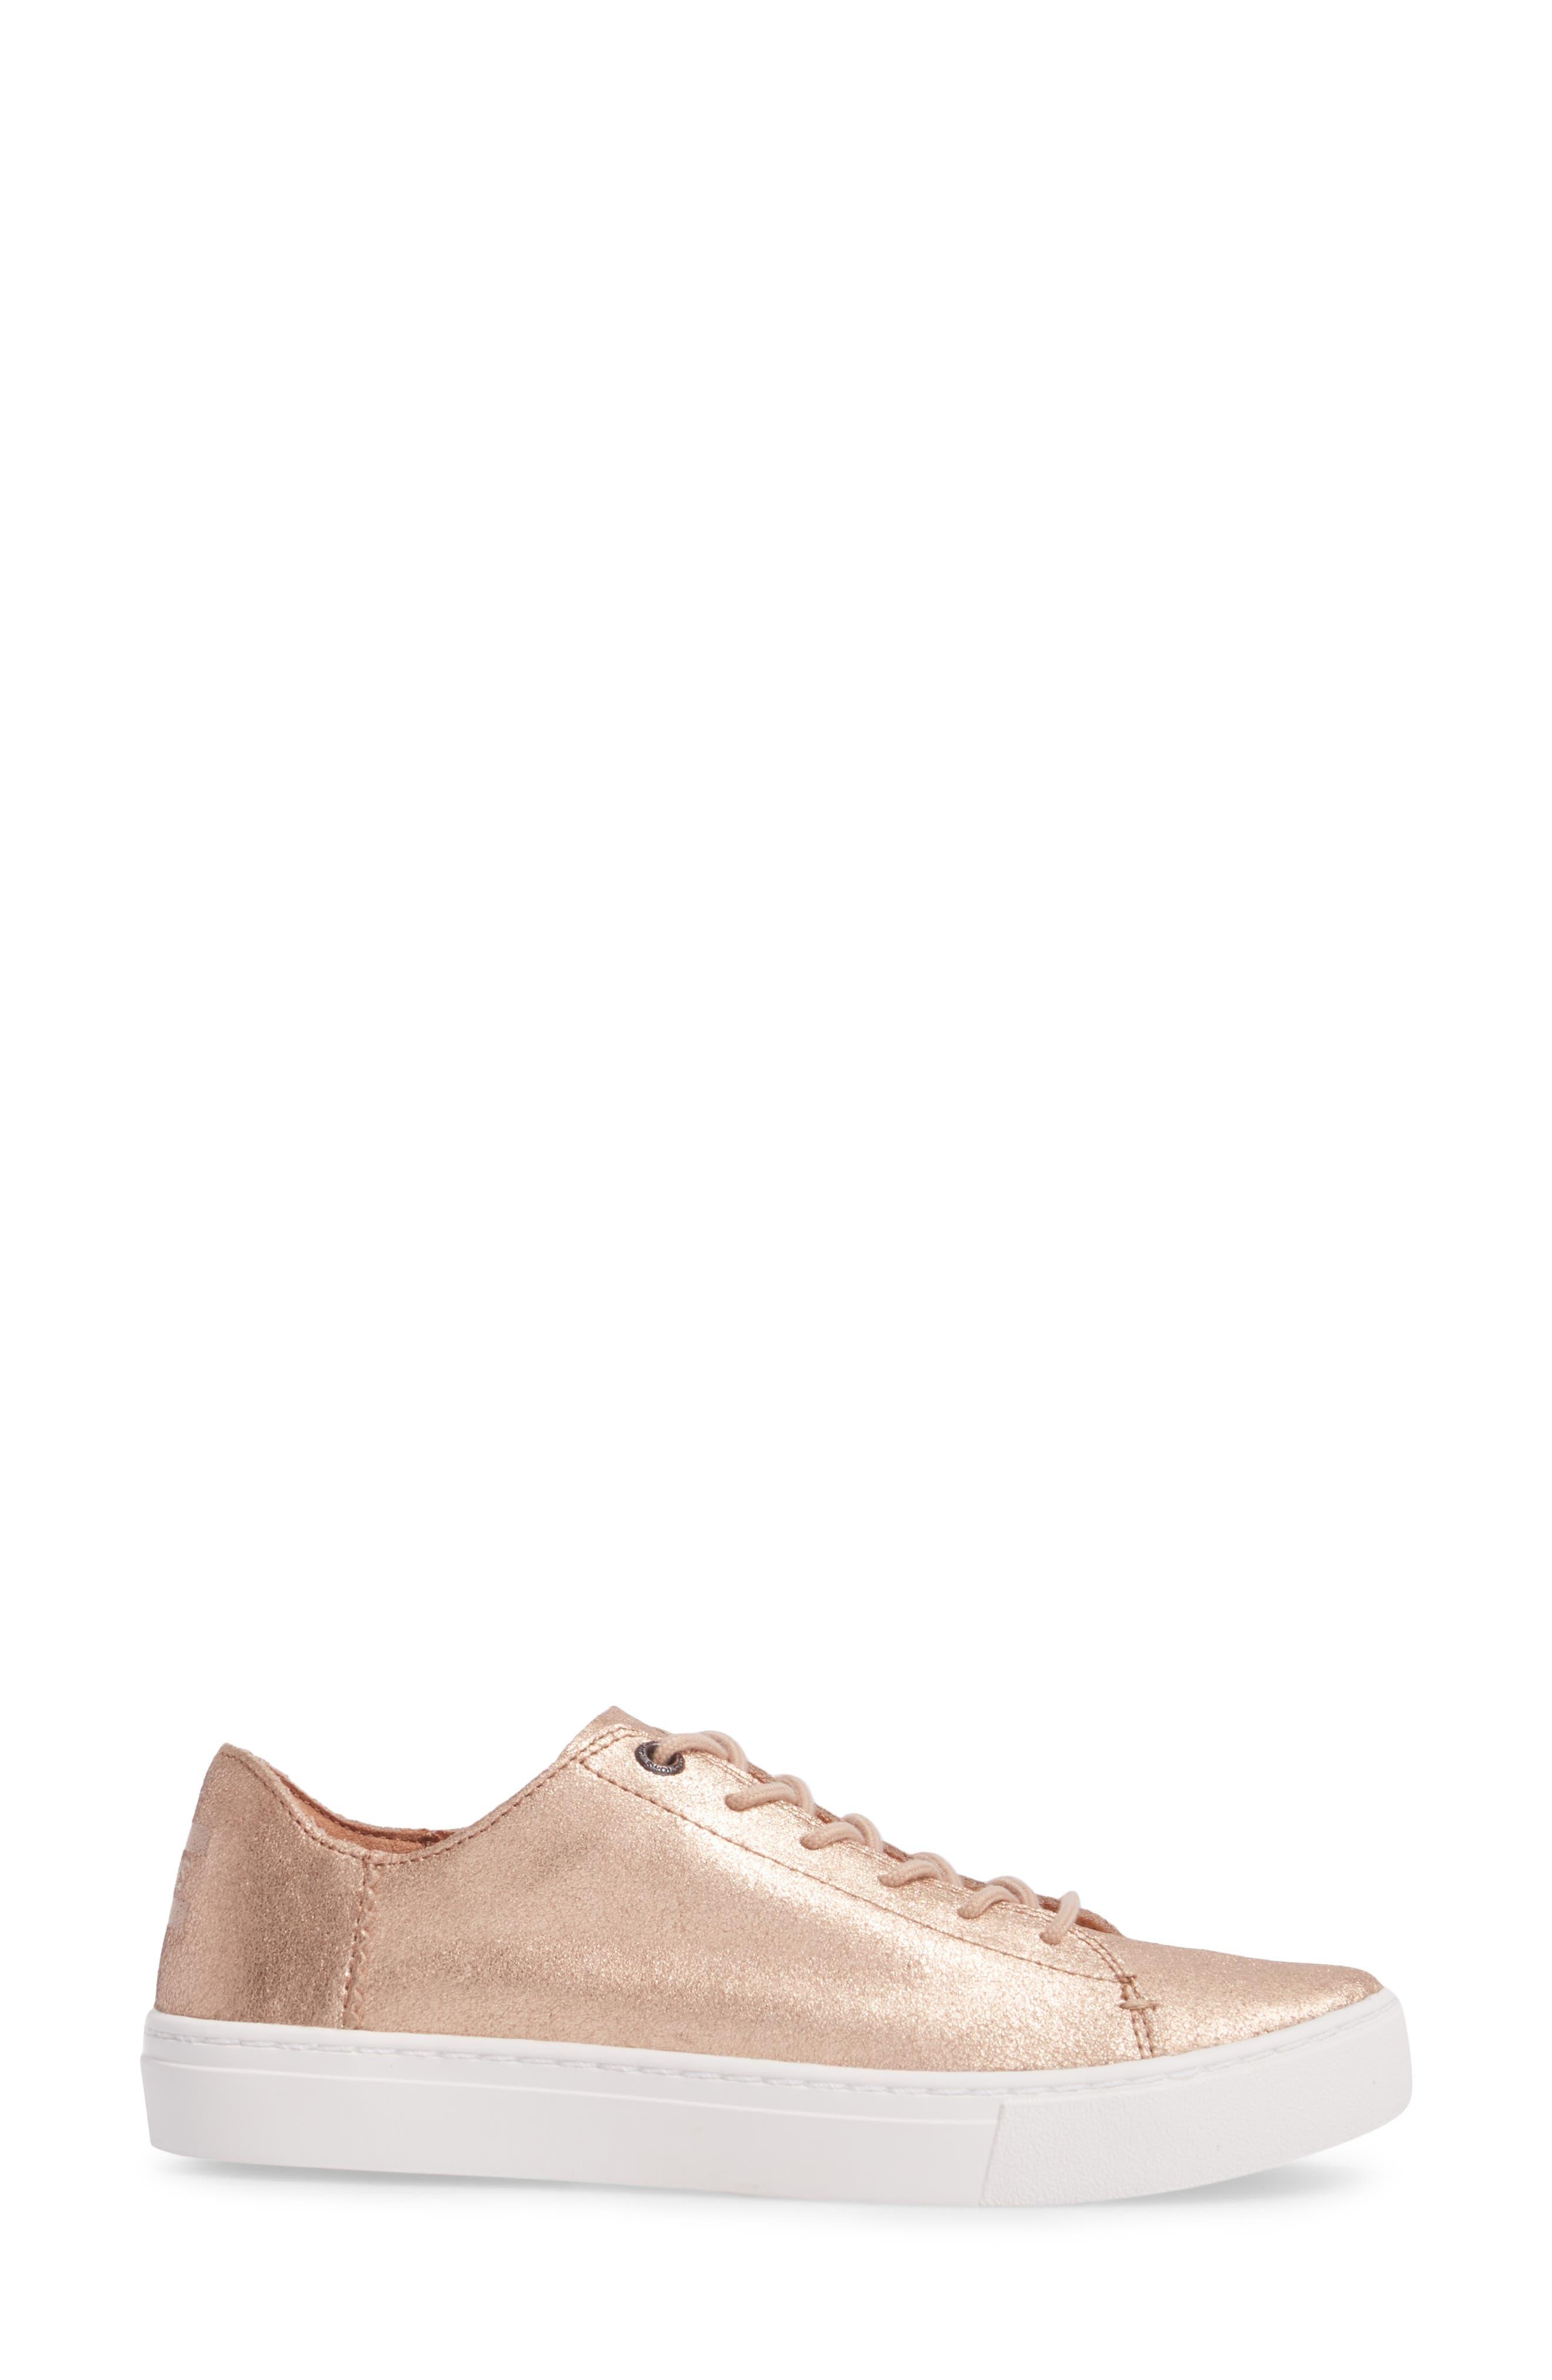 Lenox Sneaker,                             Alternate thumbnail 45, color,